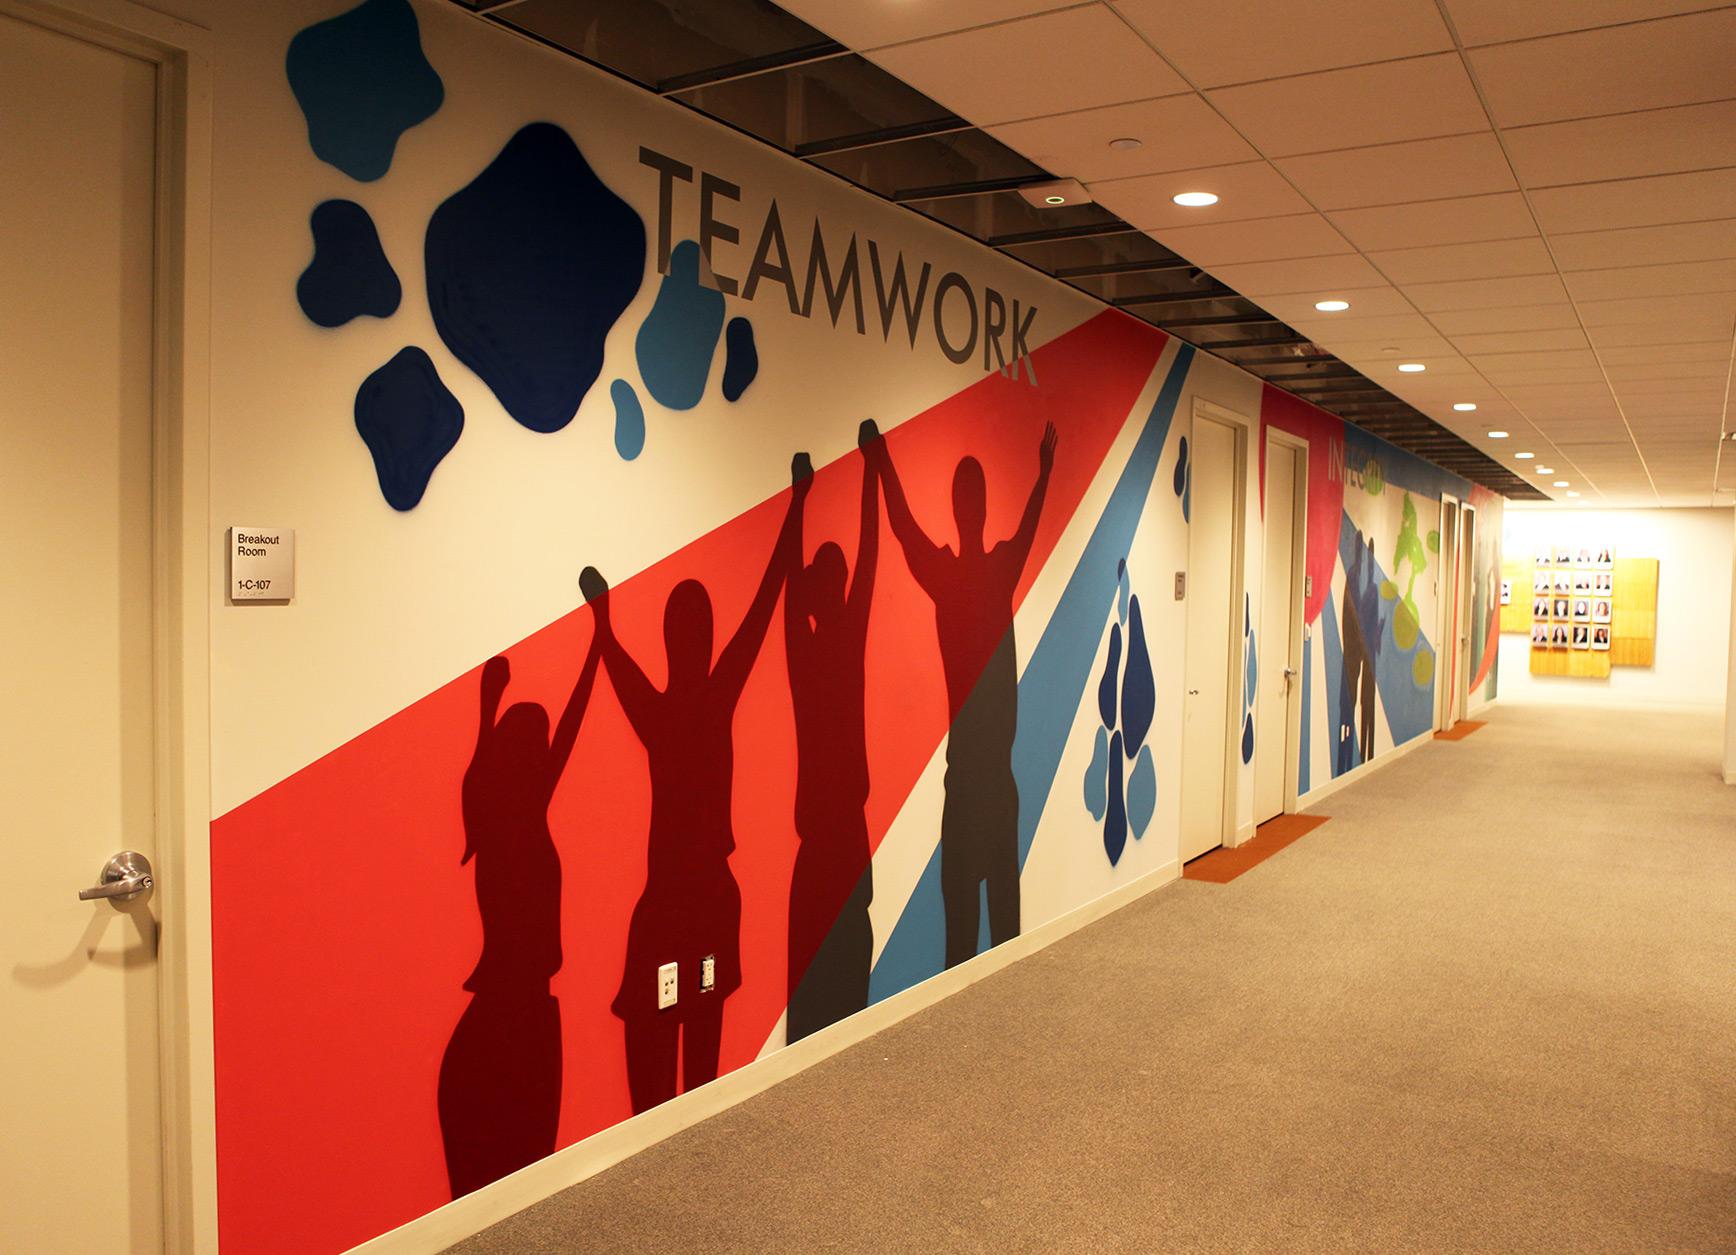 Teamwork street art mural in nj pharma graffiti usa for Corporate mural